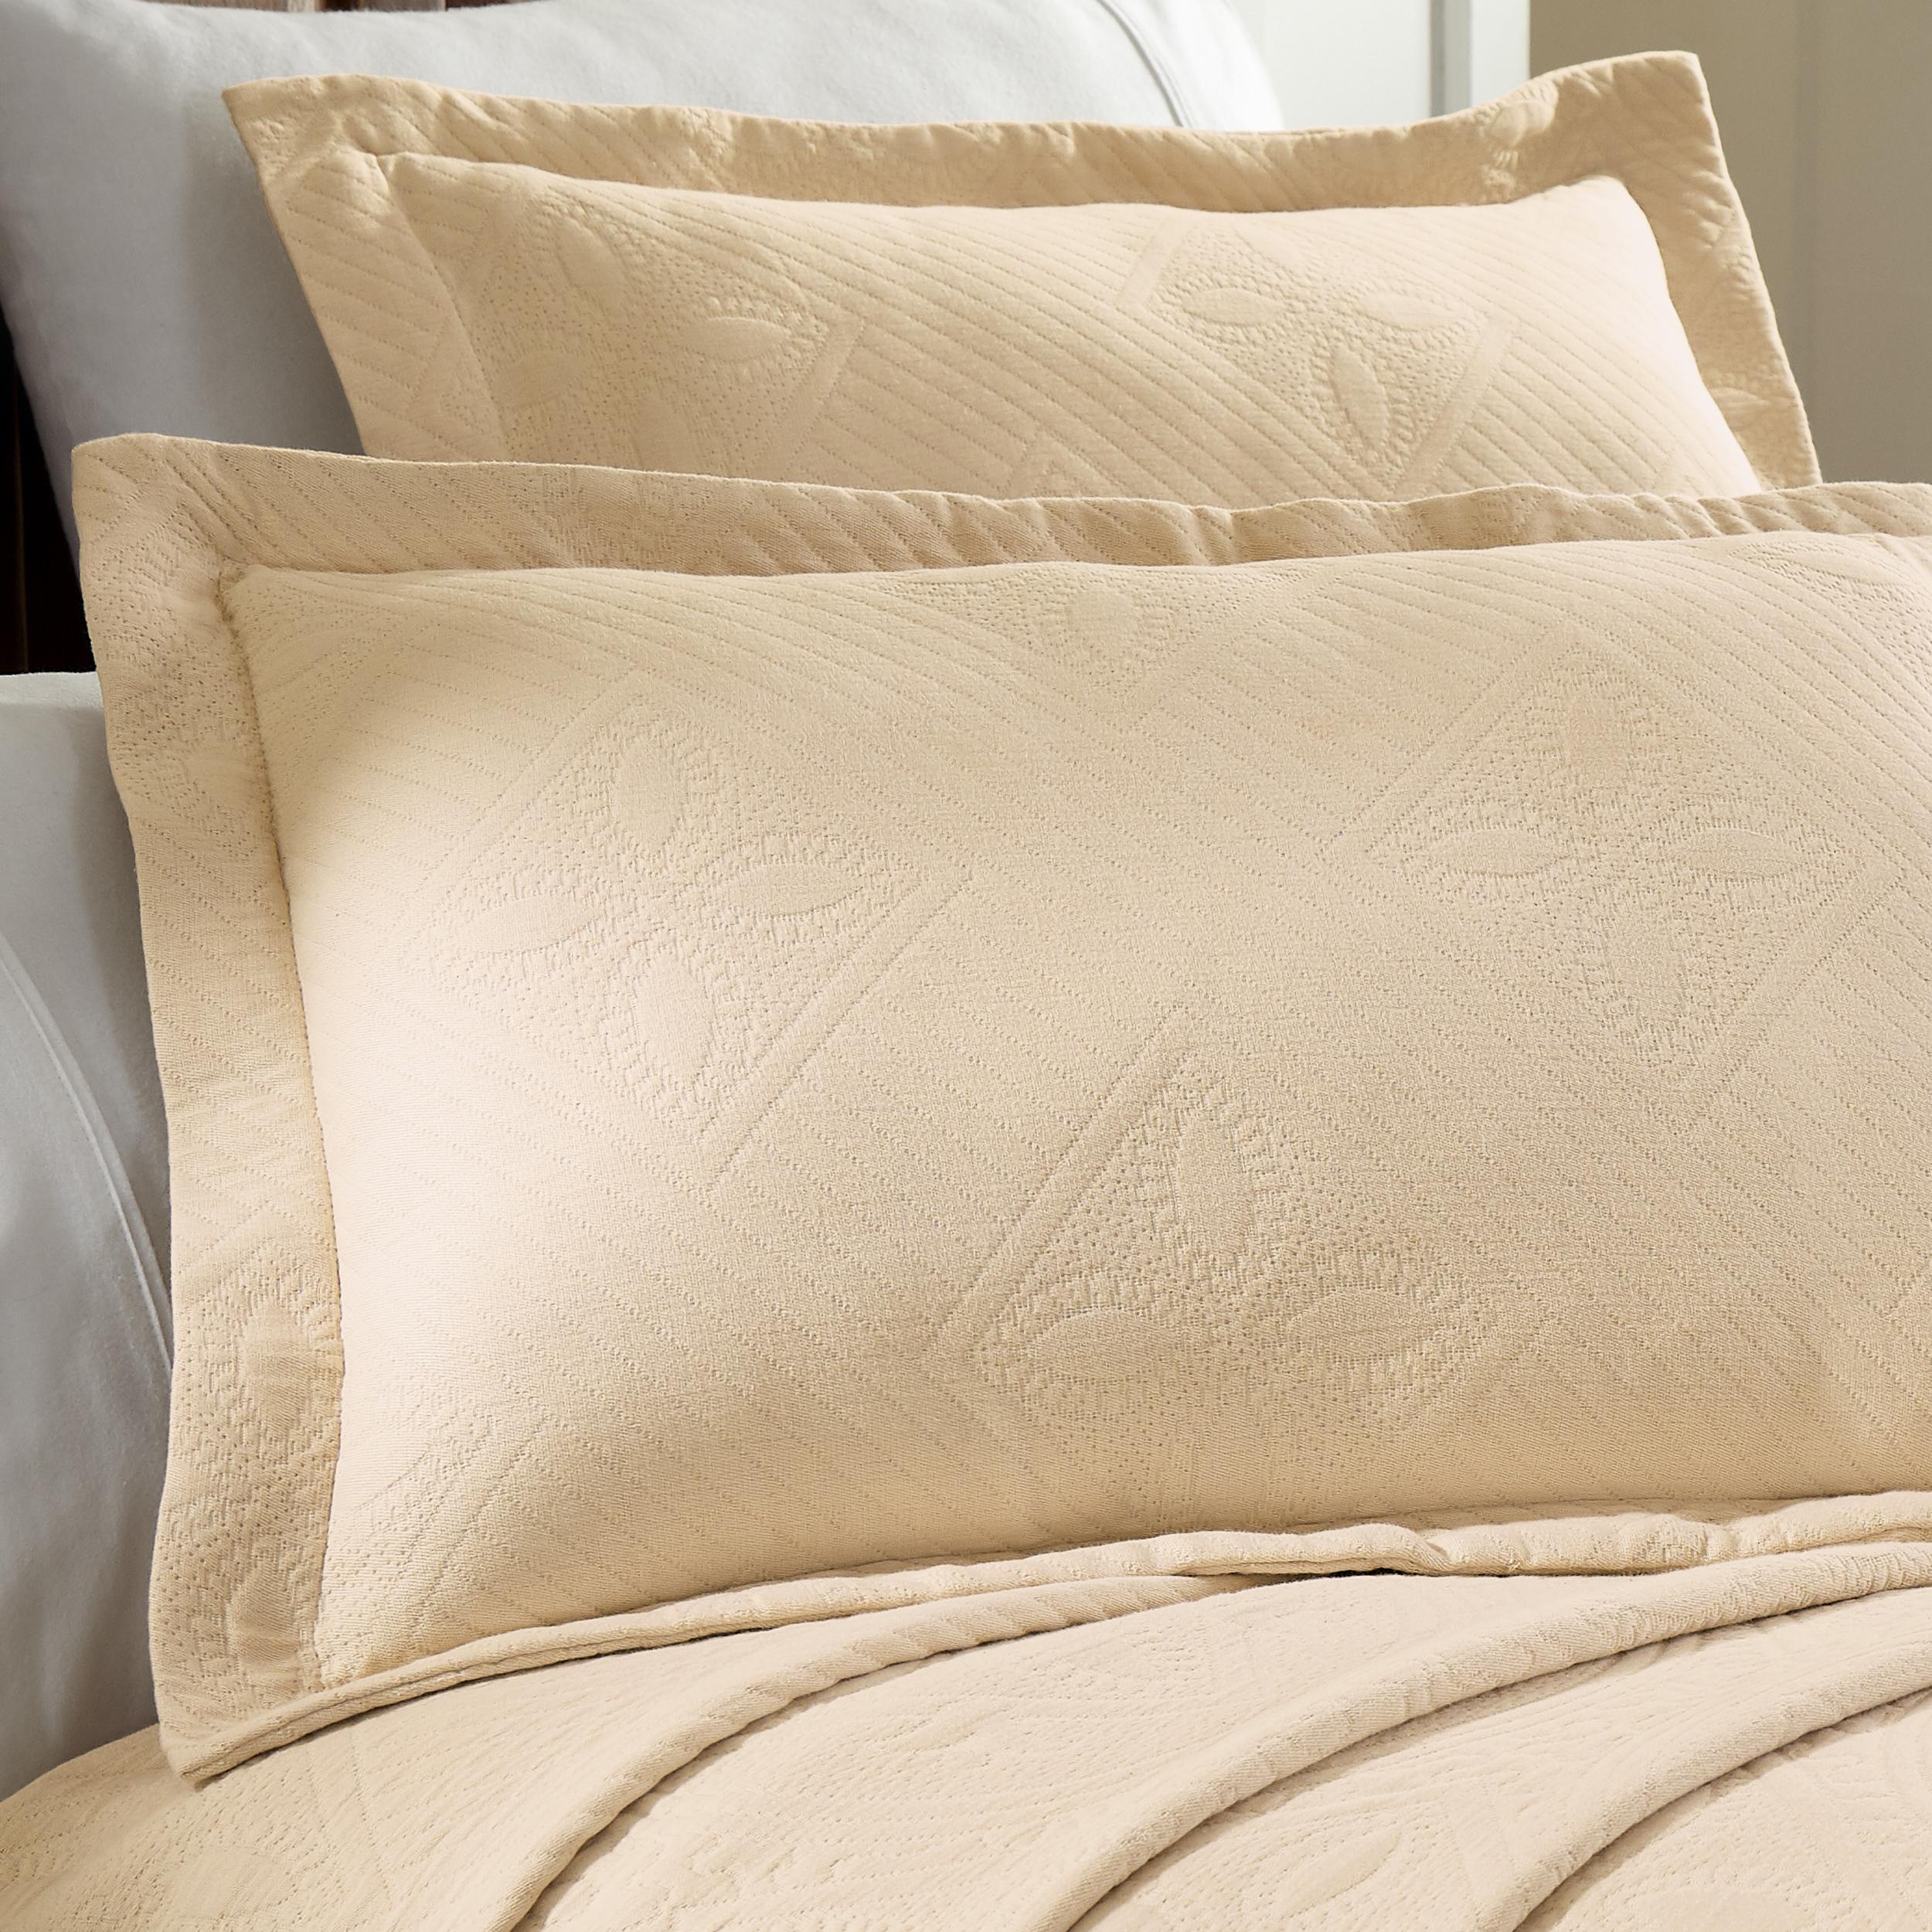 Celtic-Circle-Cotton-Jacquard-Matelasse-Scalloped-Bedspread-Set thumbnail 18